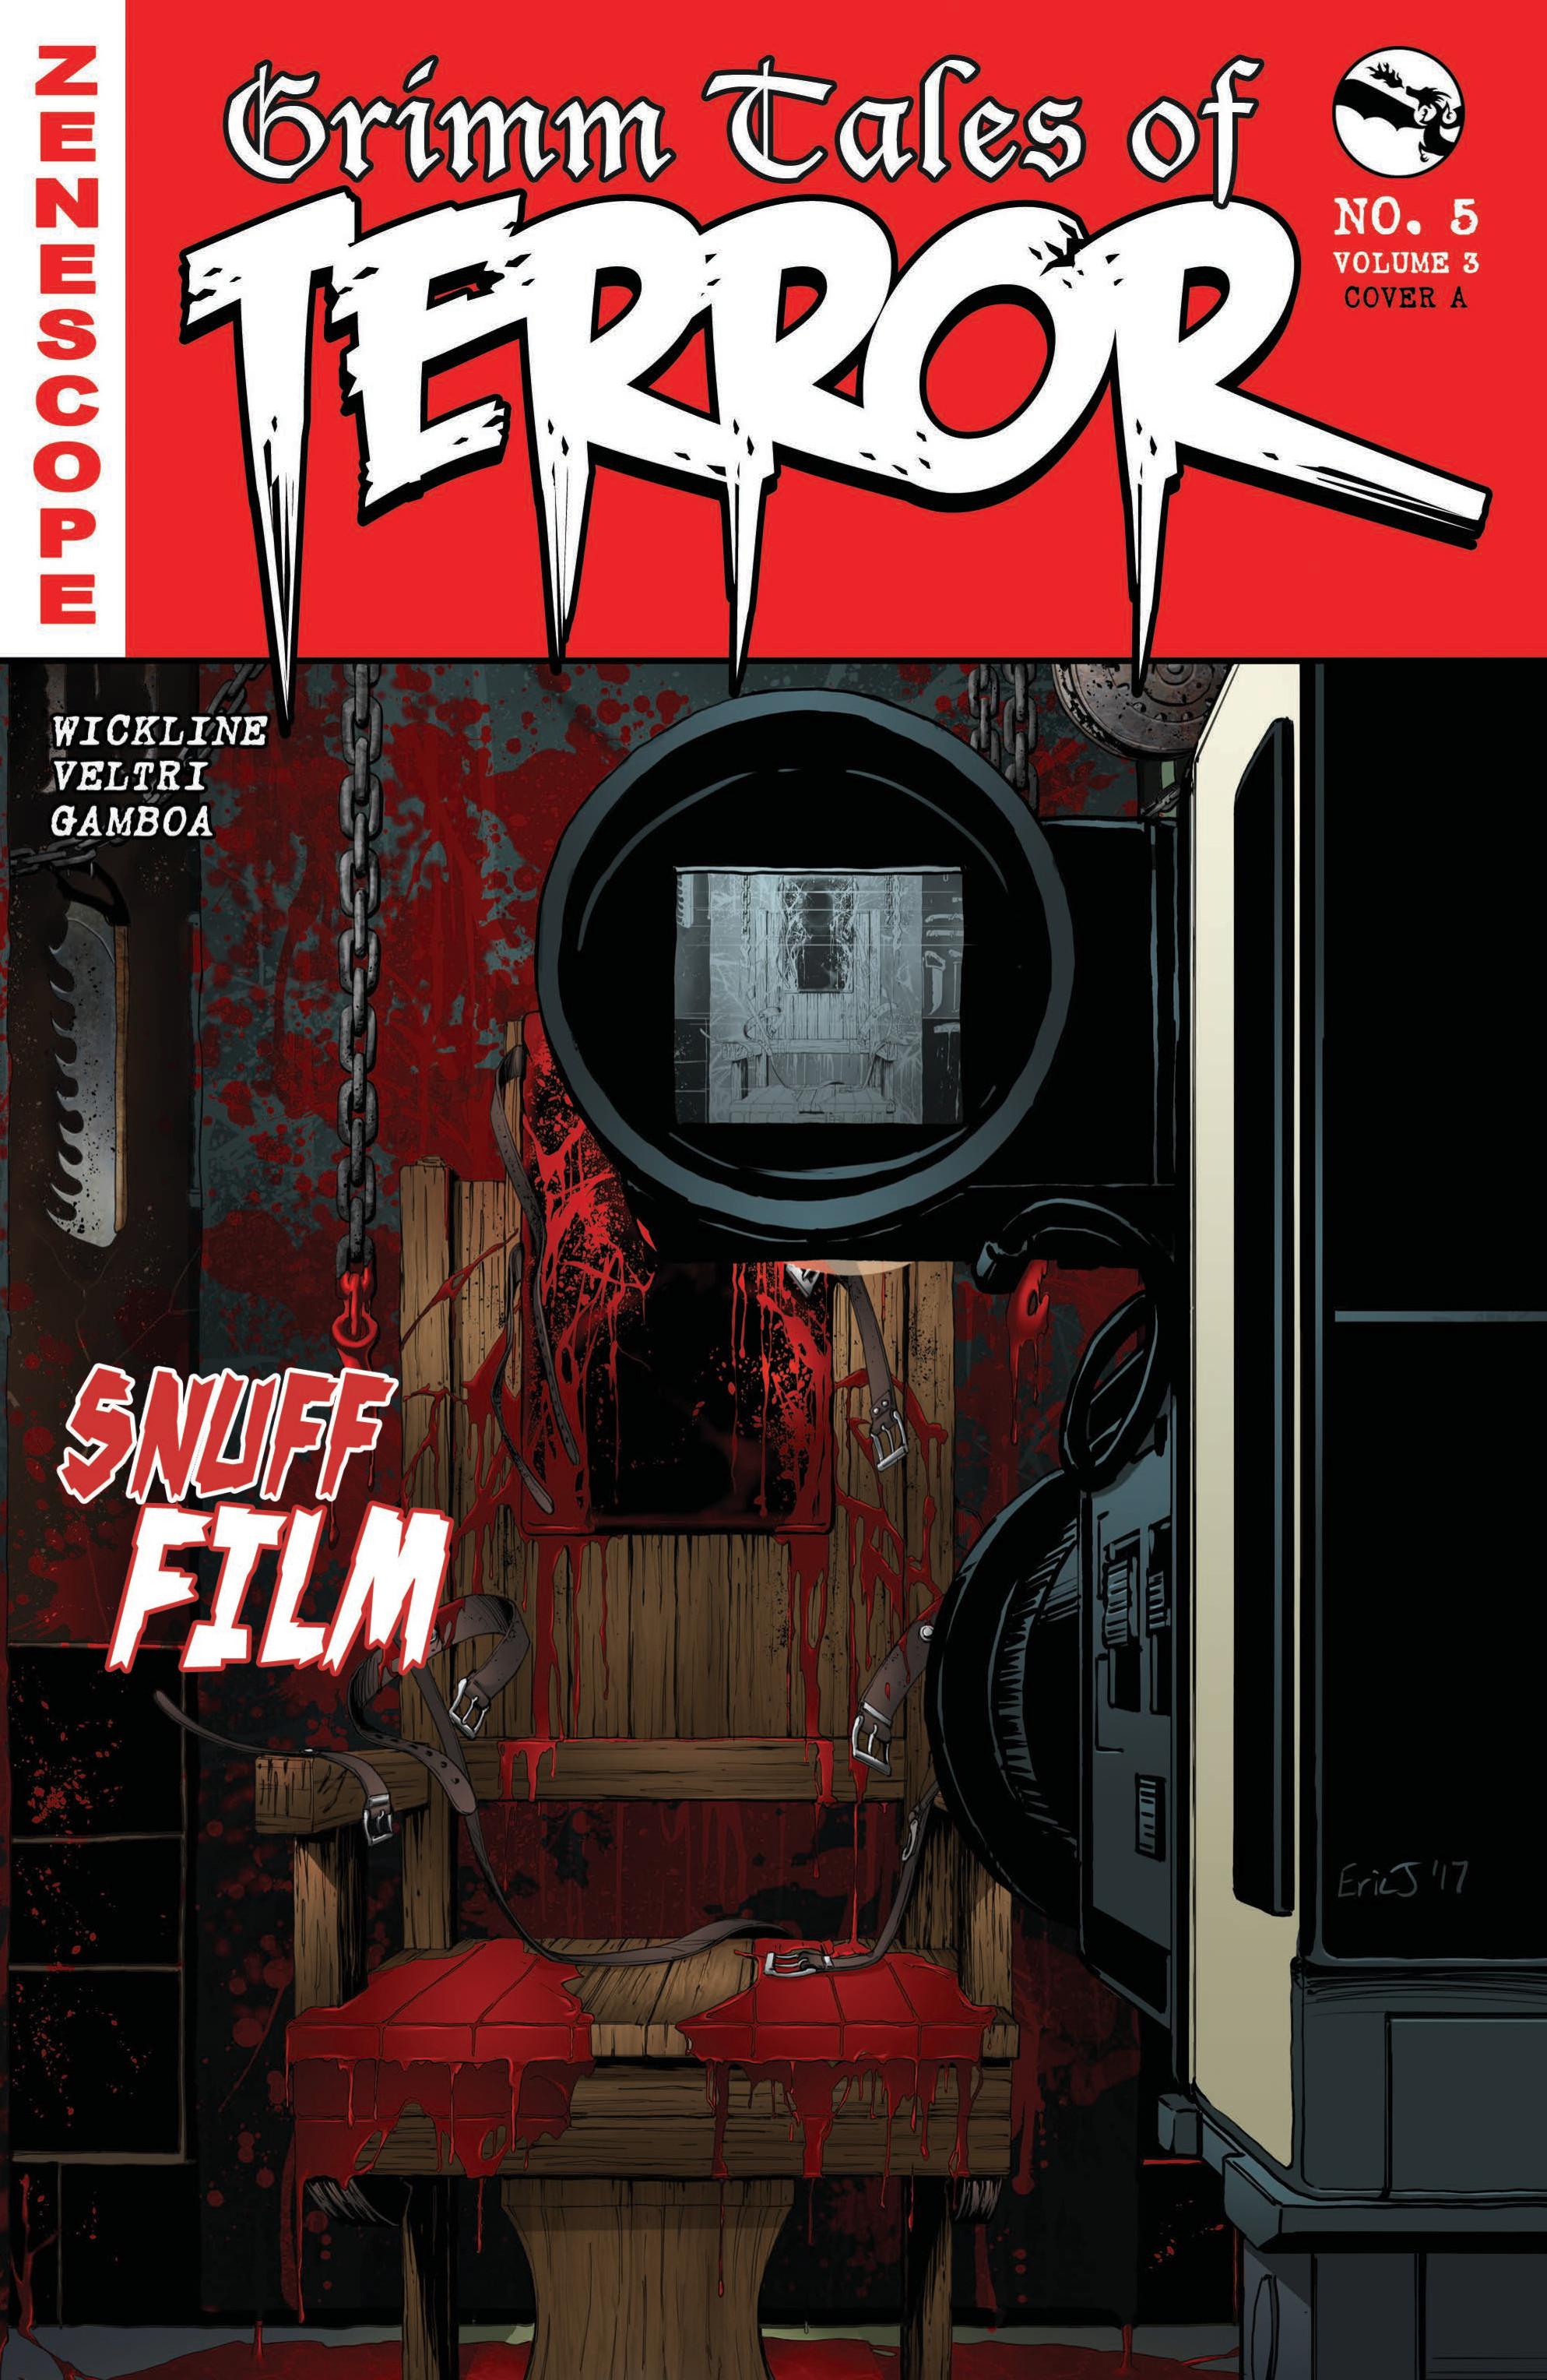 Read online Grimm Tales of Terror: Vol. 3 comic -  Issue #5 - 1